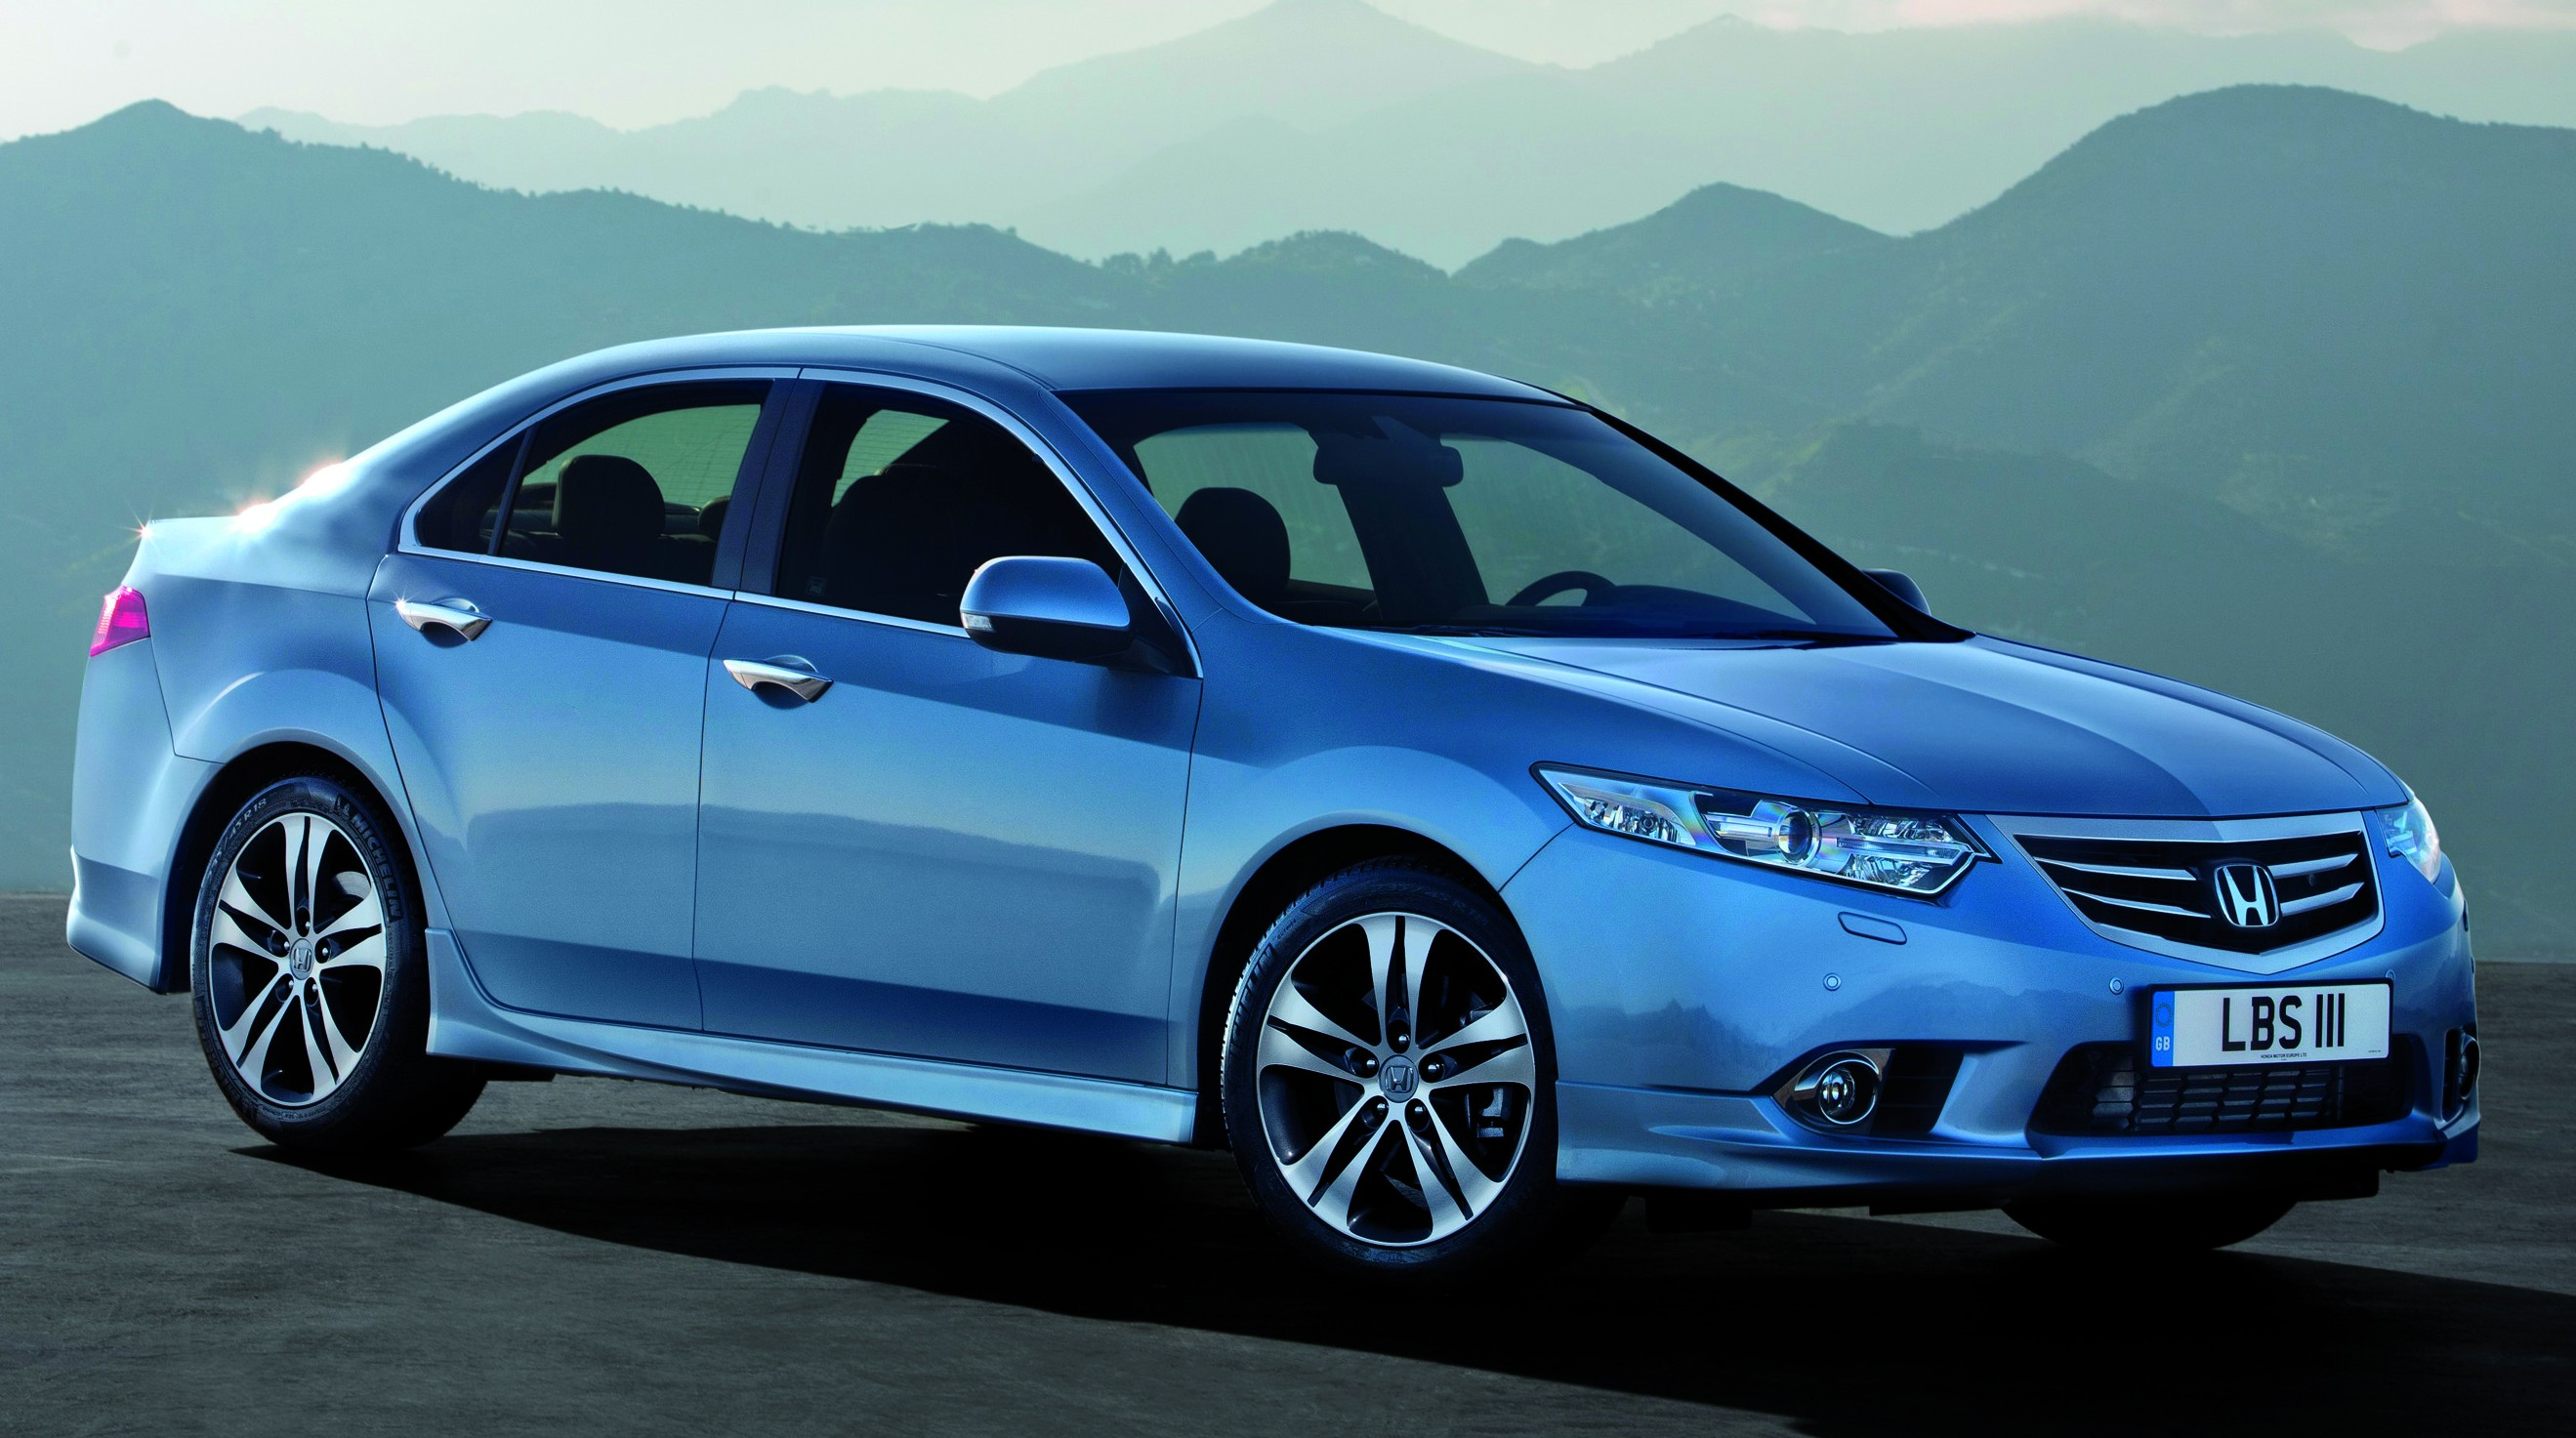 Honda Accord 2014 For Sale Honda Accord Euro to be terminated globally in 2015